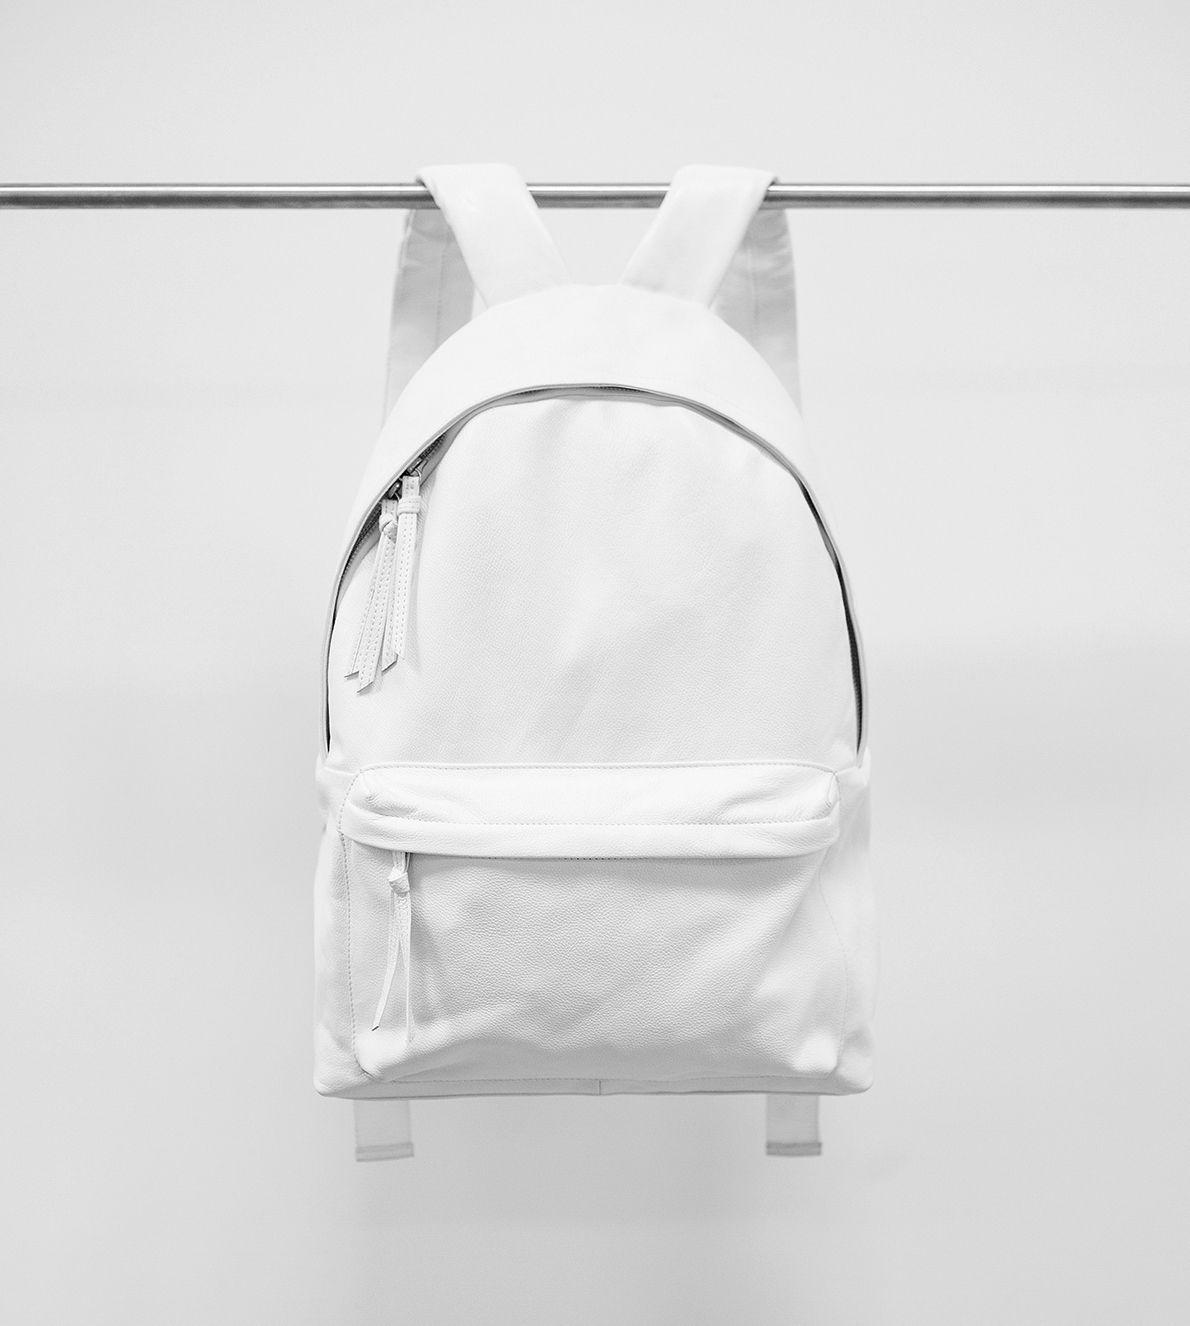 25 White Bathroom Ideas Design Pictures: Best 25+ White Backpack Ideas On Pinterest